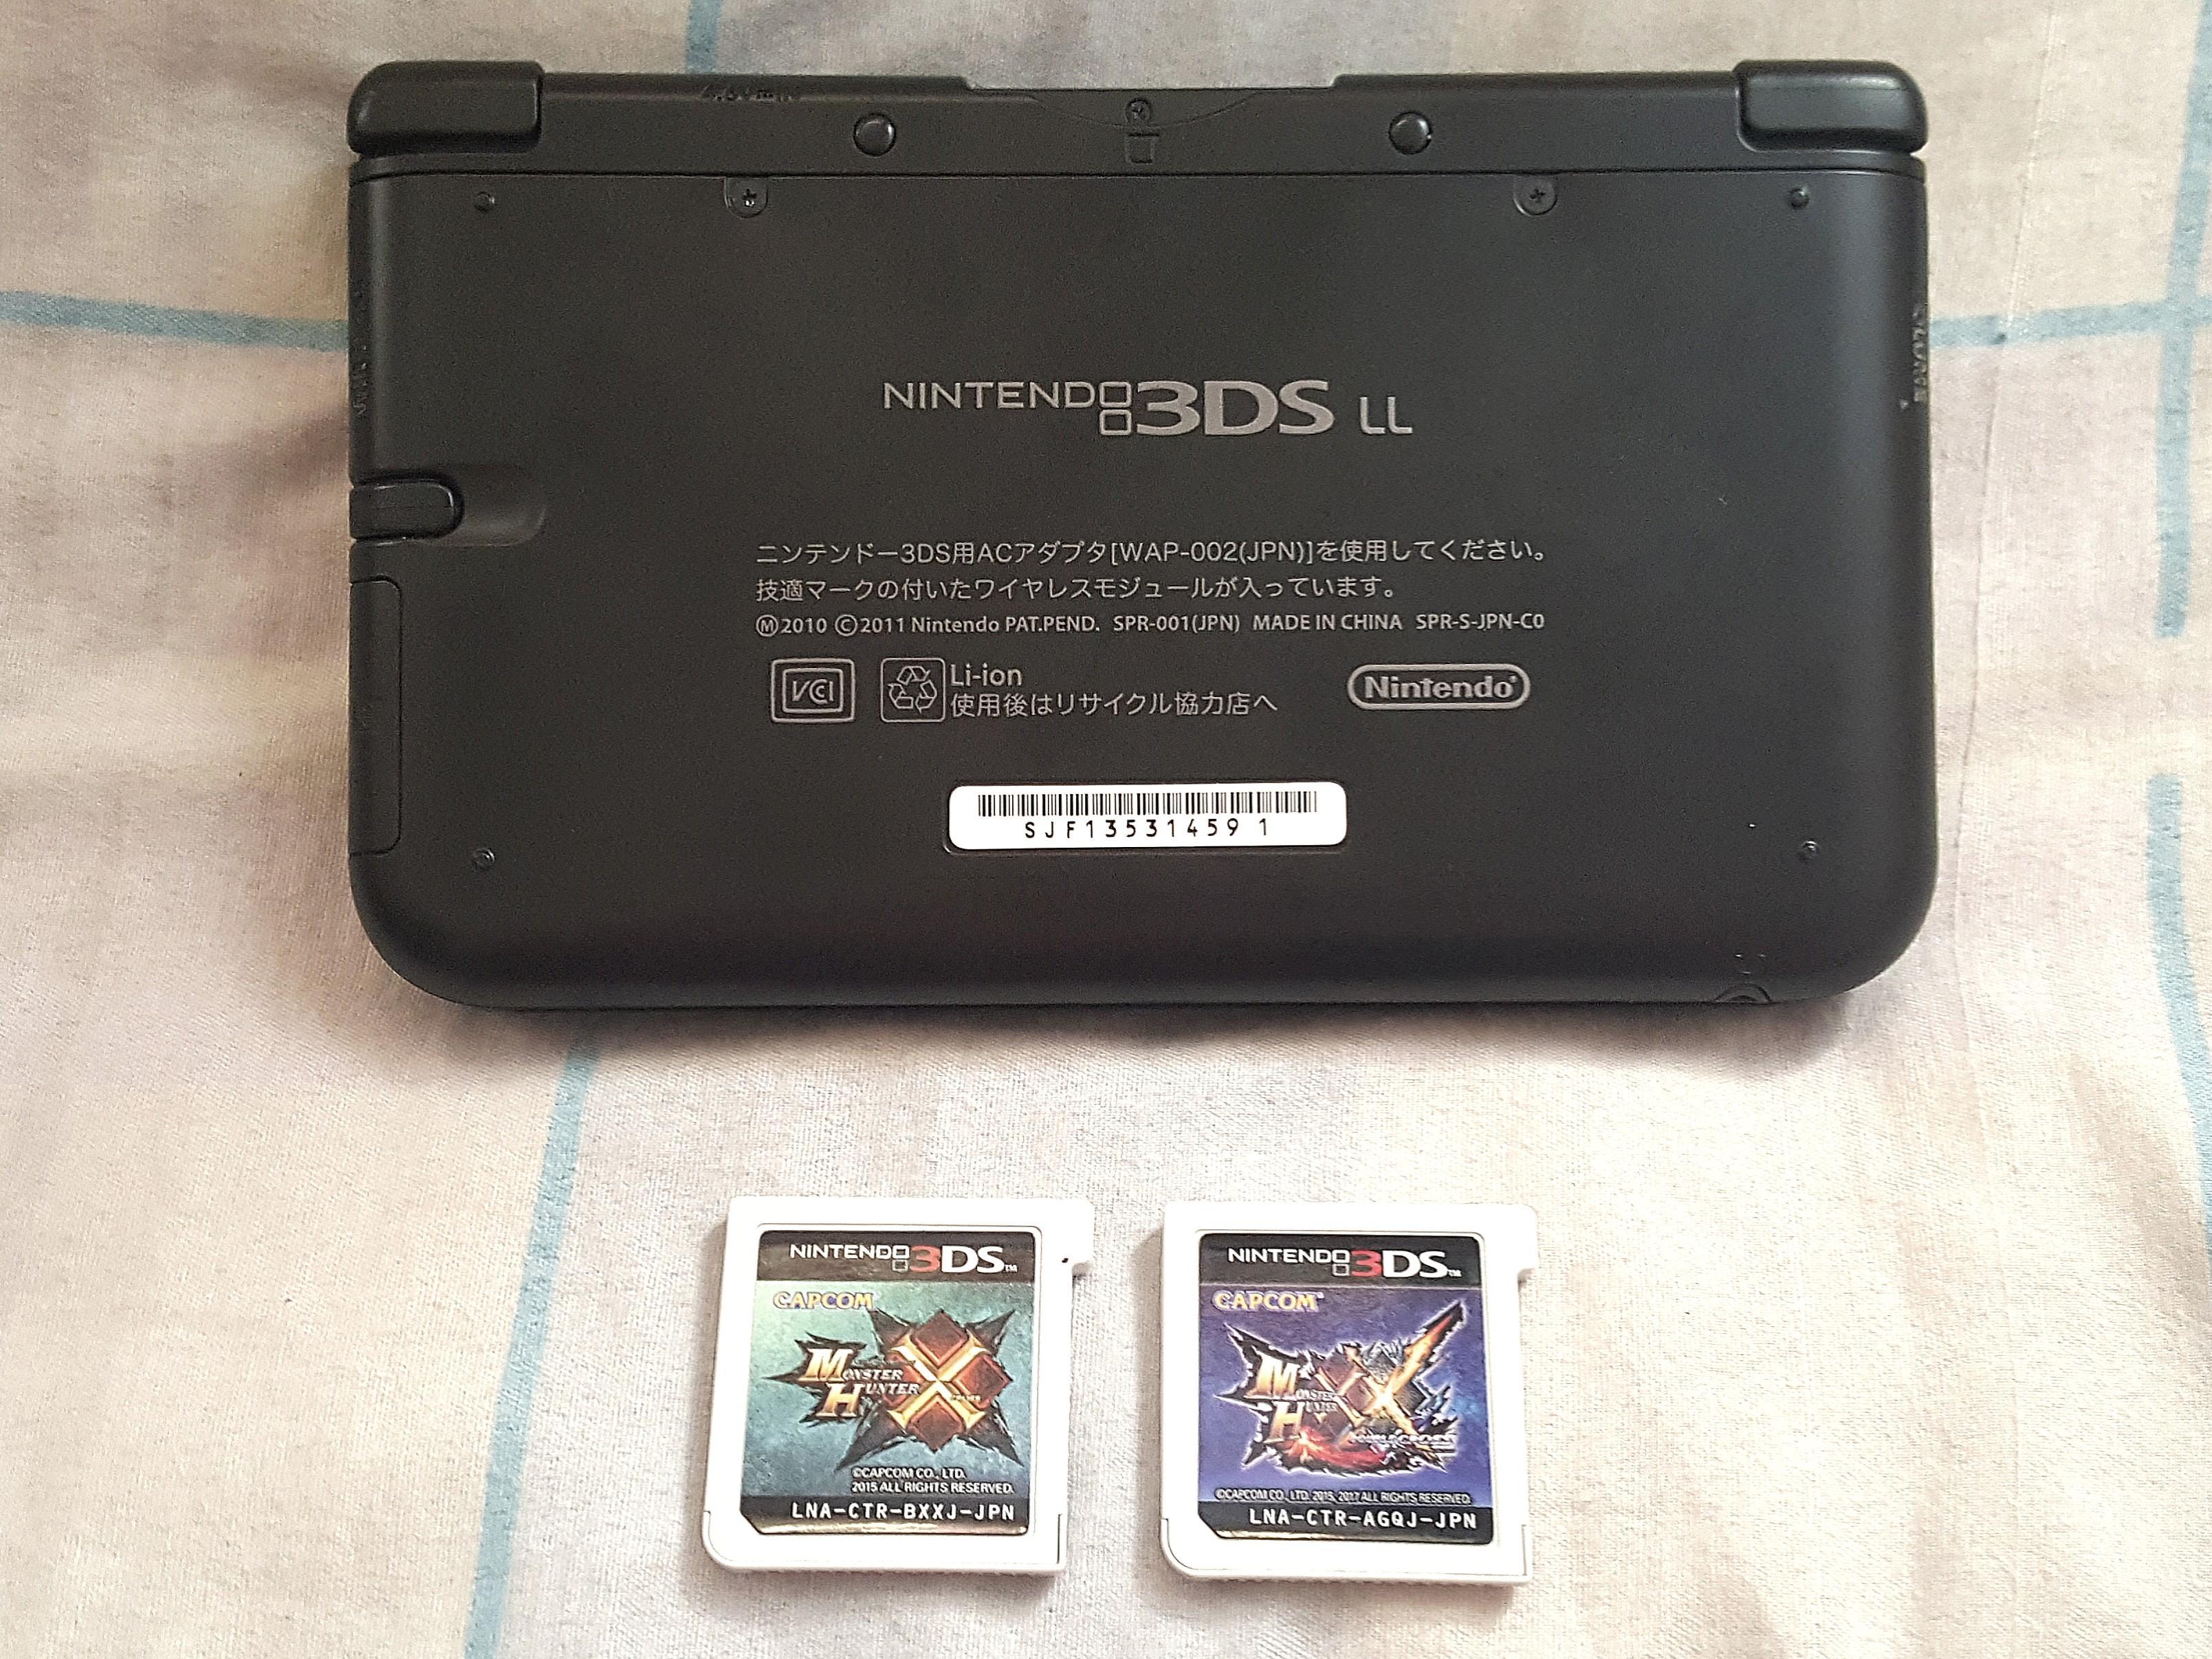 Nintendo 3DS LL Japan Version. Have 2 Original 3DS Game, Monster Hunter X & Monster Hunter XX, Japan Versions. 100% Work 3DS!